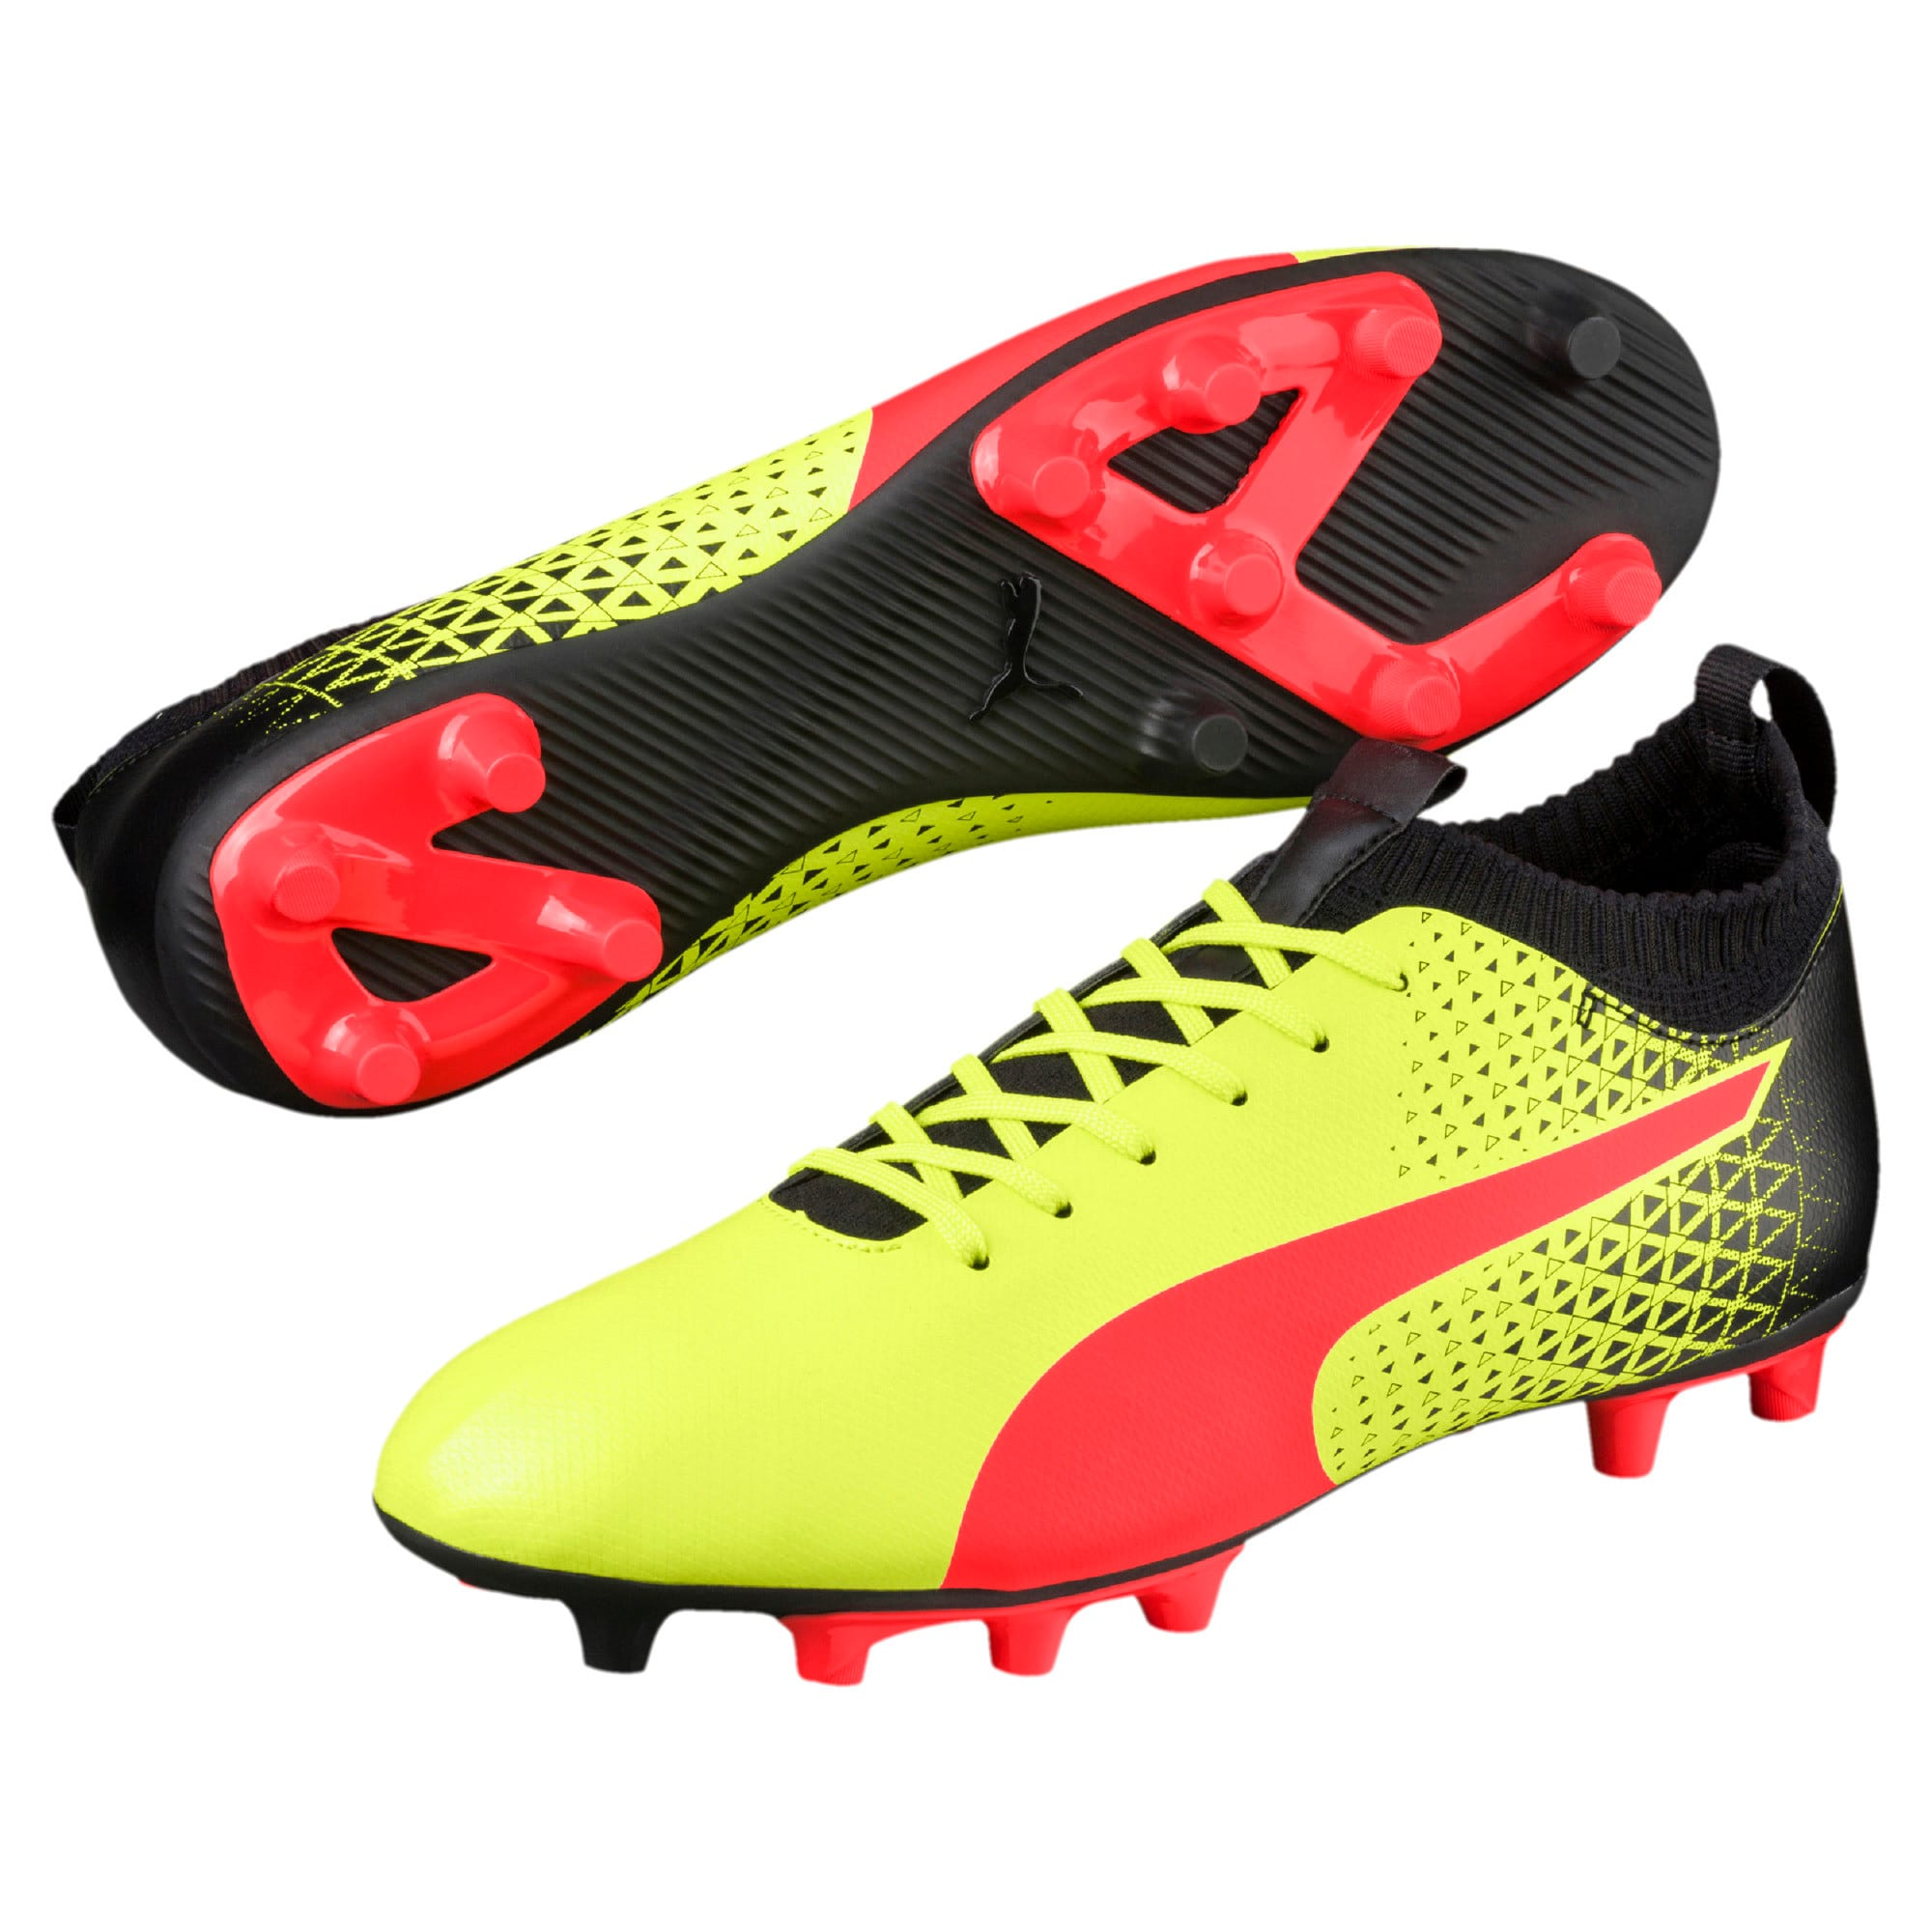 Thumbnail 2 of evoKNIT FG Men's Football Boots, Yellow-Red-Black, medium-IND